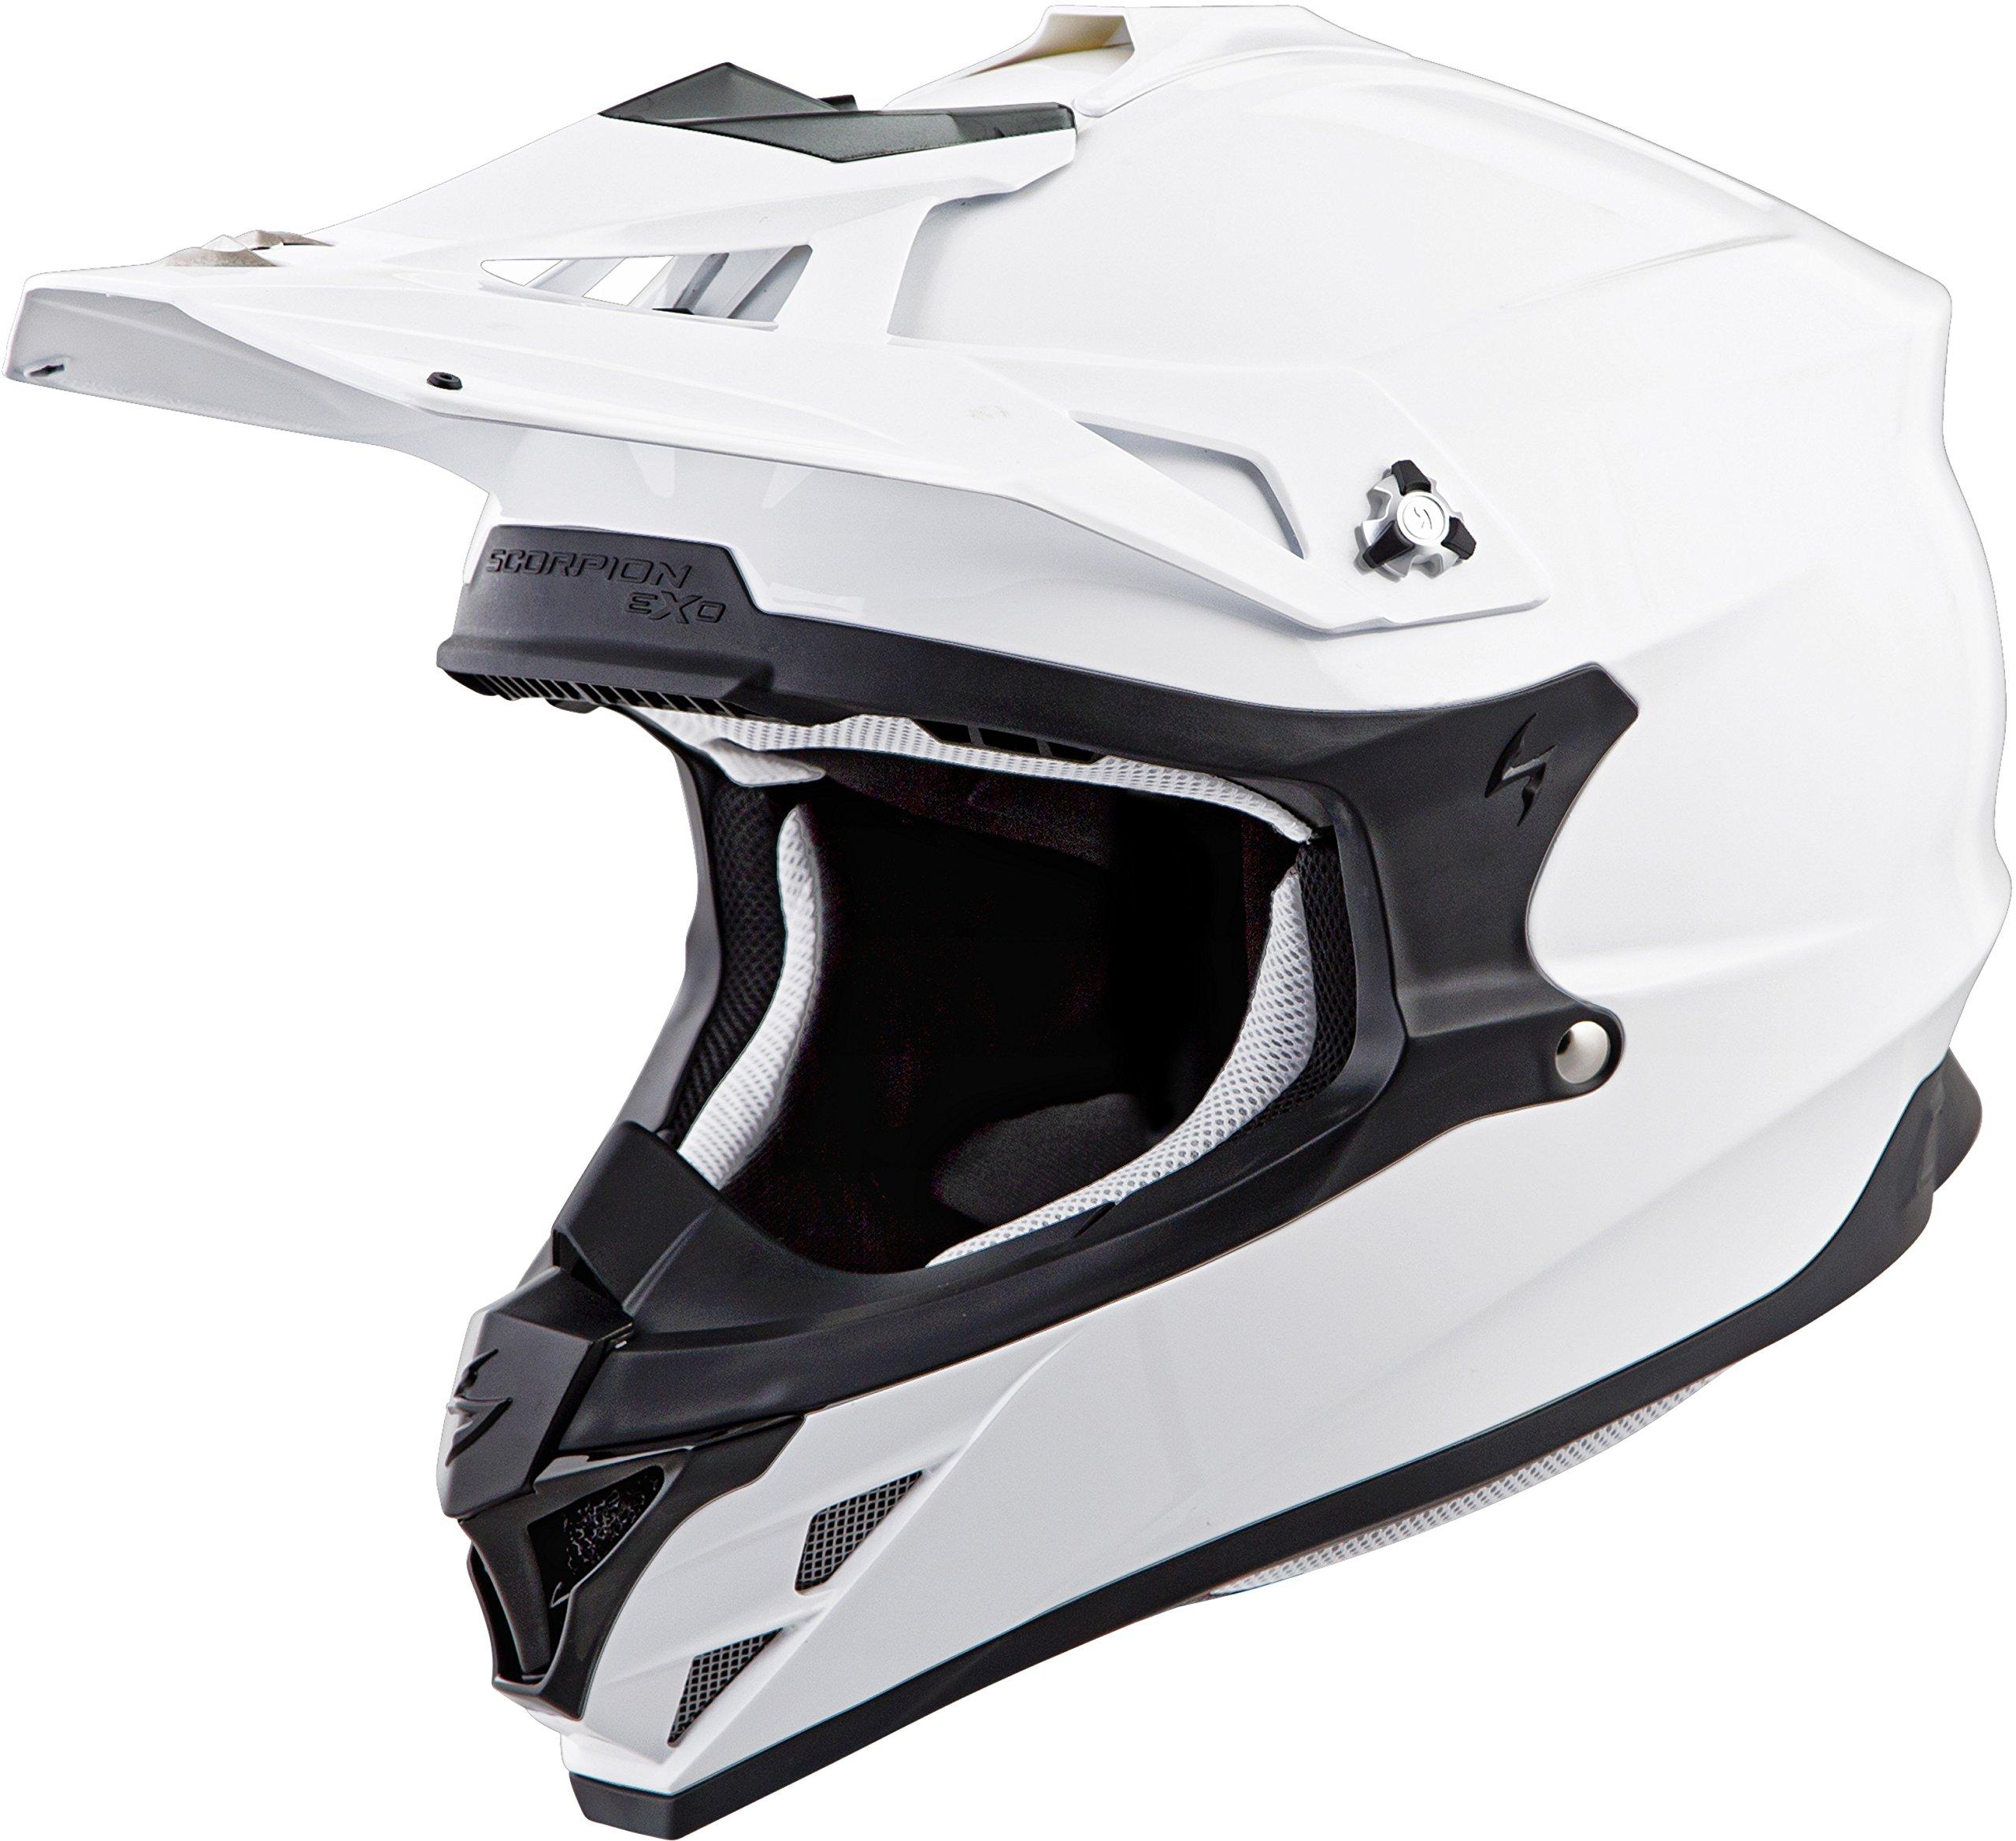 Scorpion Kwikwick EXO-T510 Liner Street Motorcycle Helmet Accessories - Grey/X-Large by Scorpion